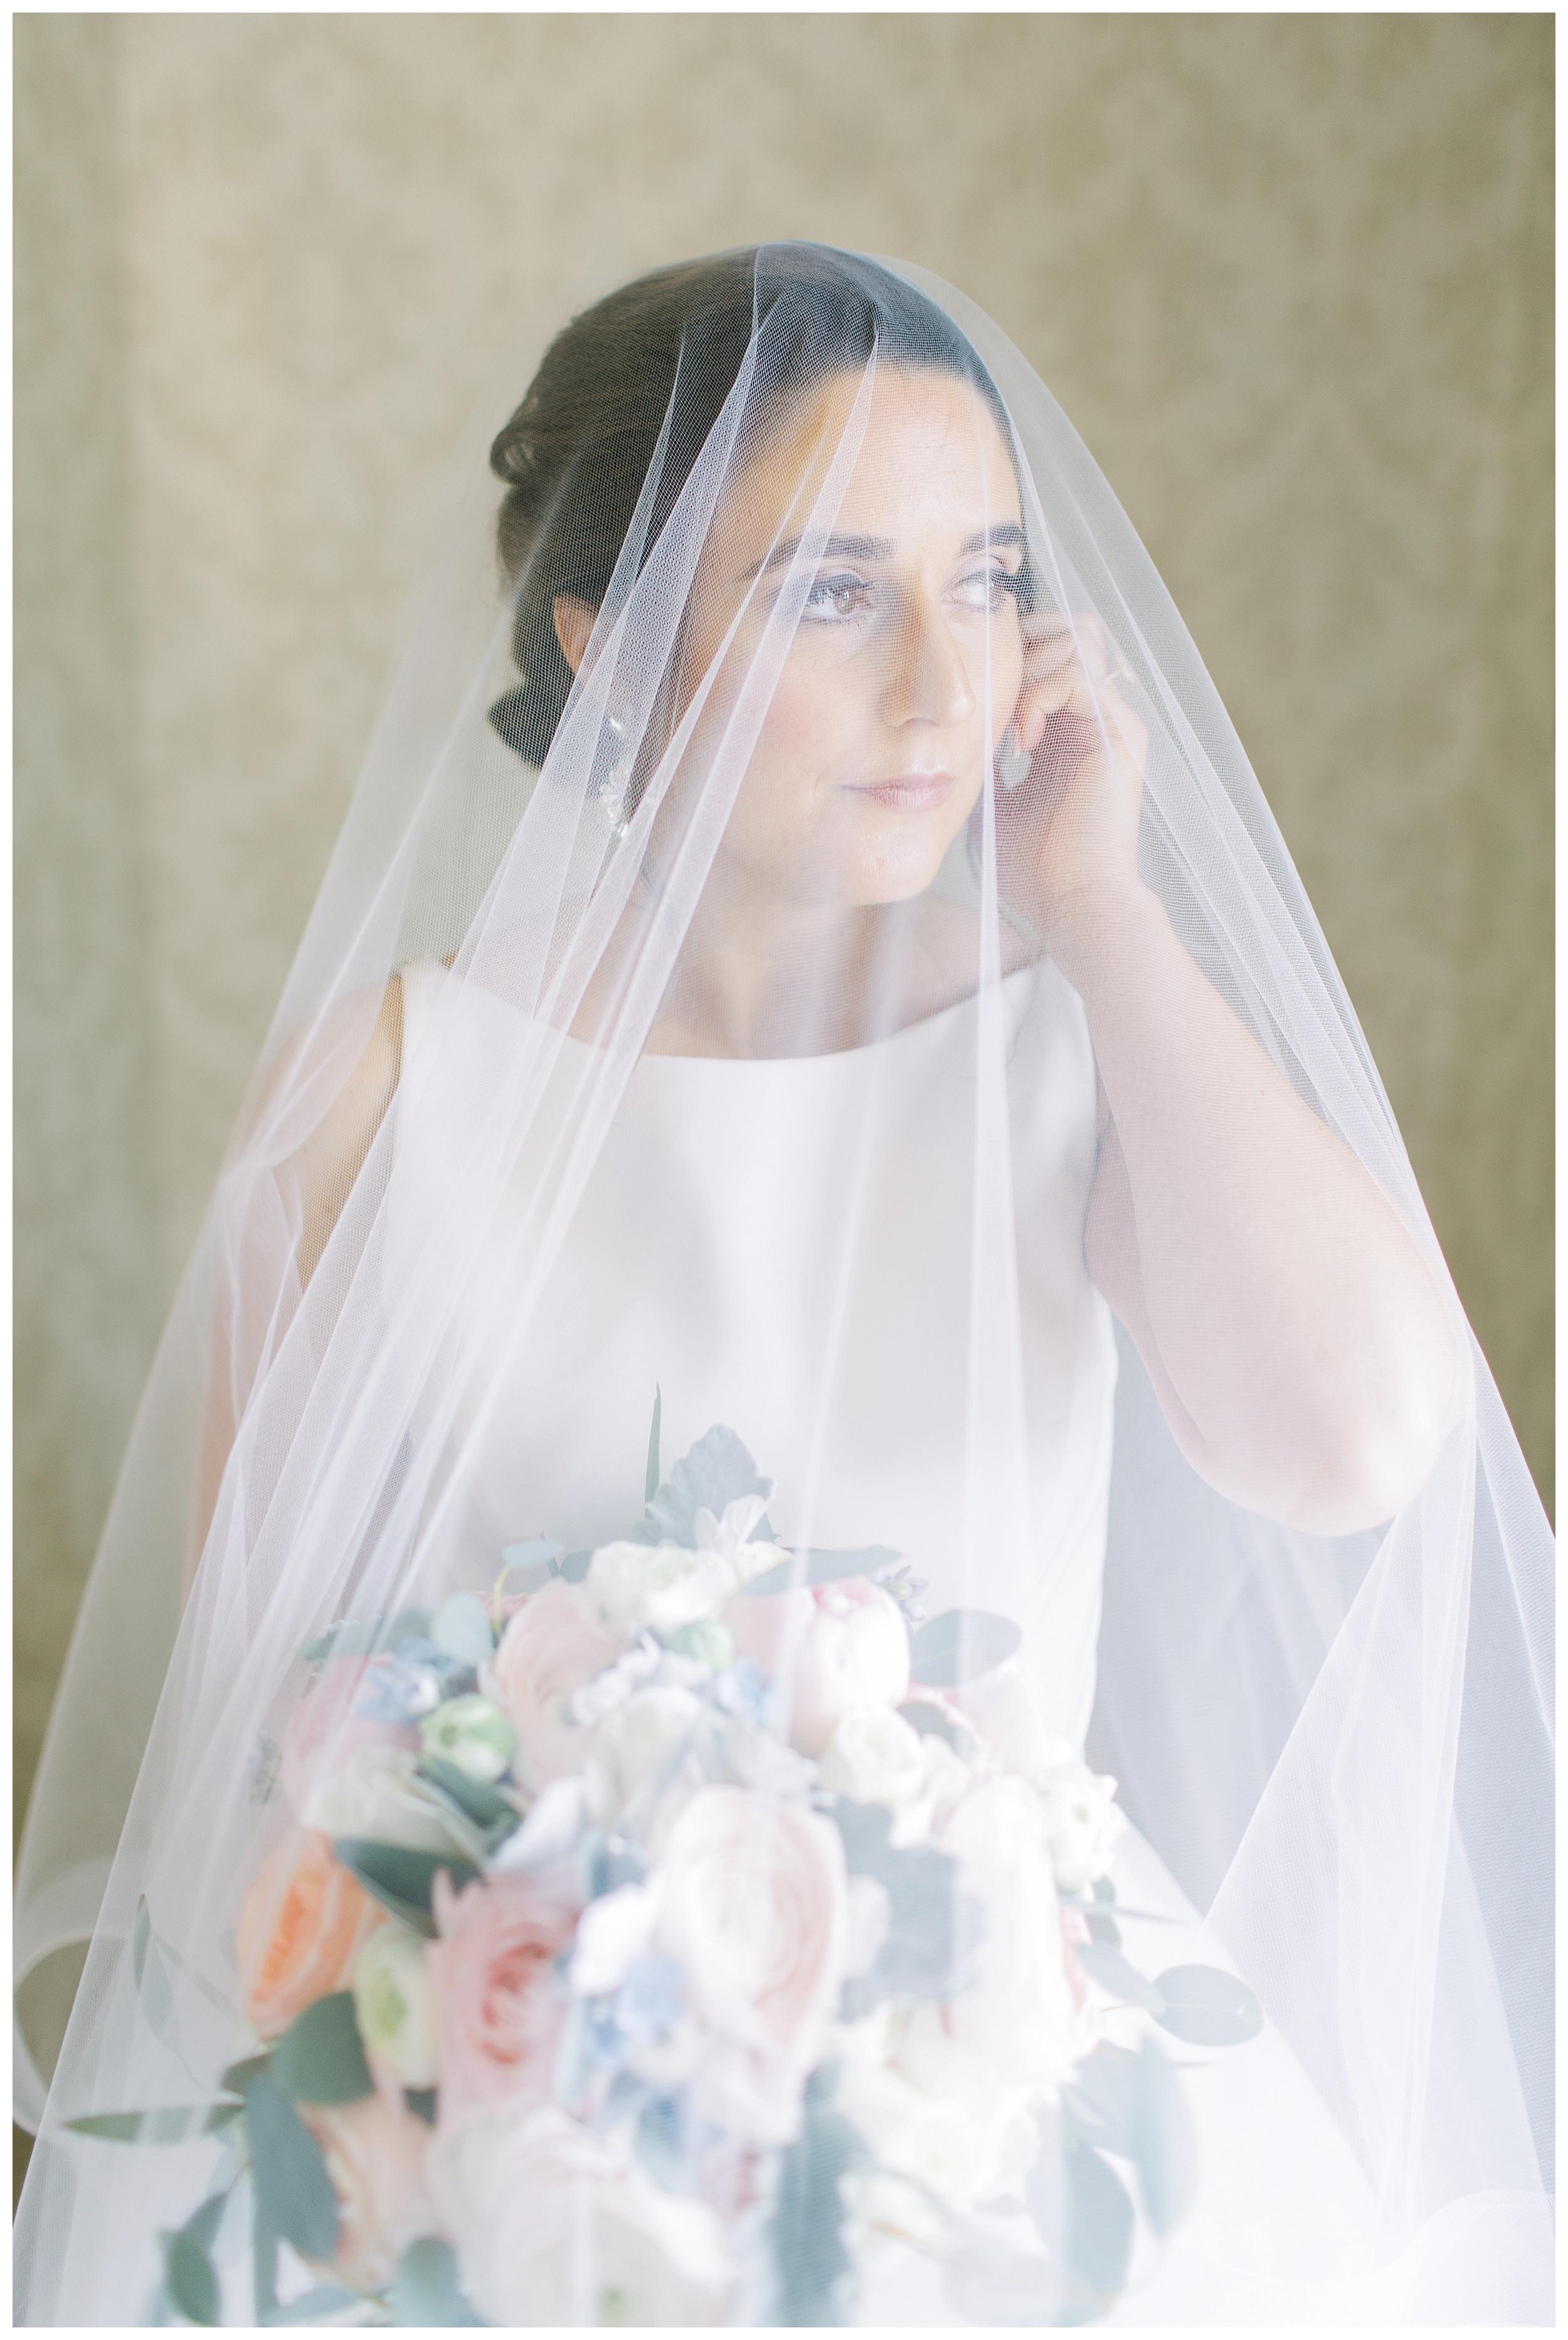 DAR Constitution Hall Wedding Wedding | Daughters of the American Revolution Wedding | District of Columbia Film Wedding Photographer Kir Tuben_0023.jpg